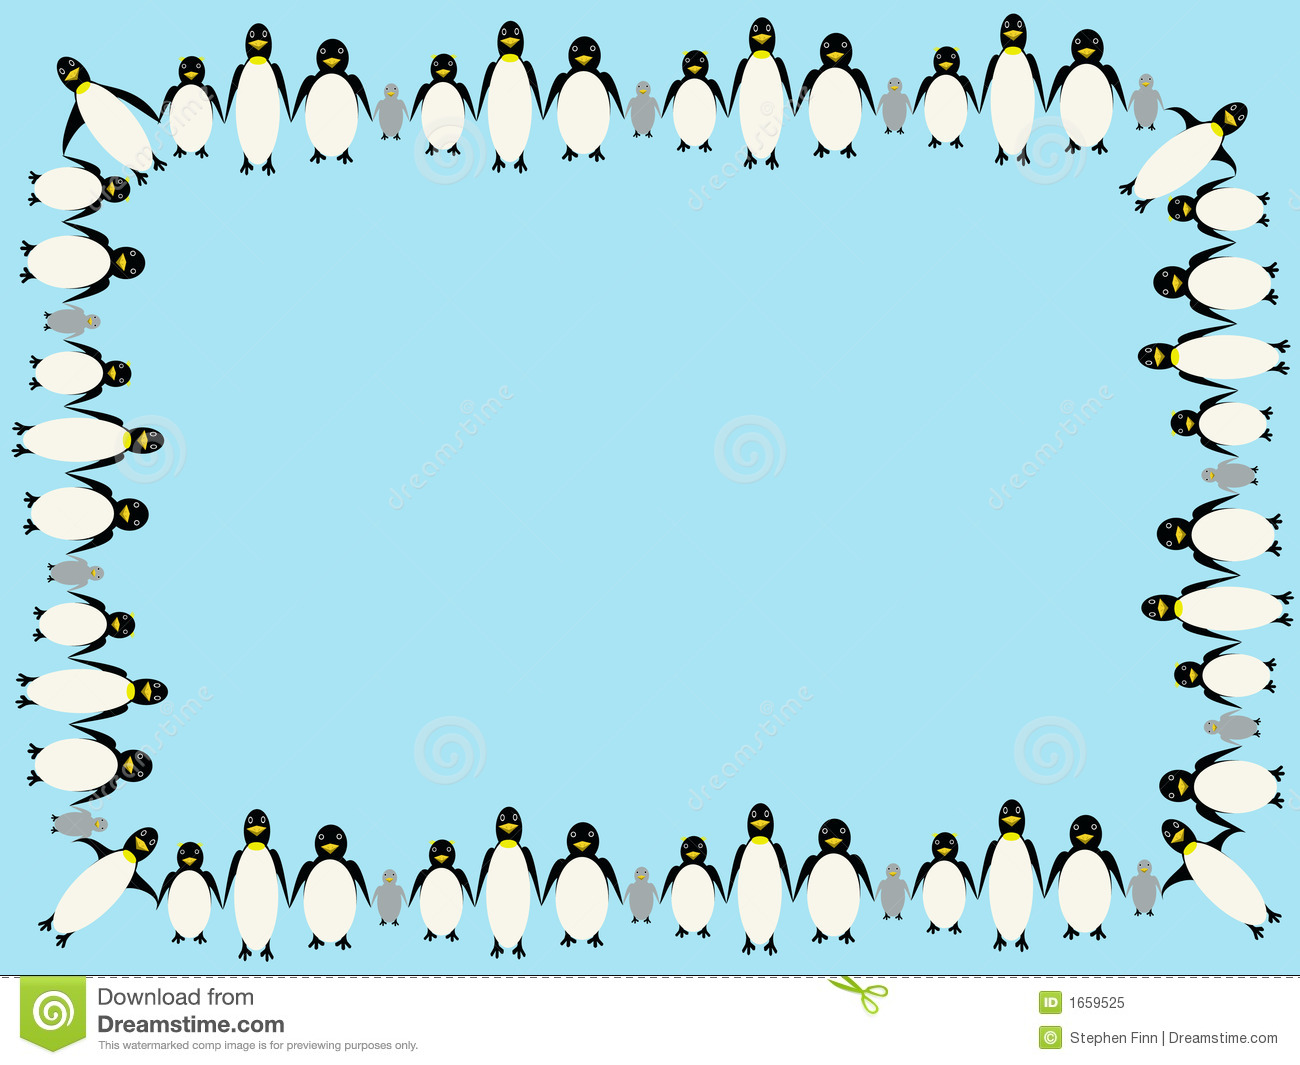 Penguin Border Clipart - Clipart Kid